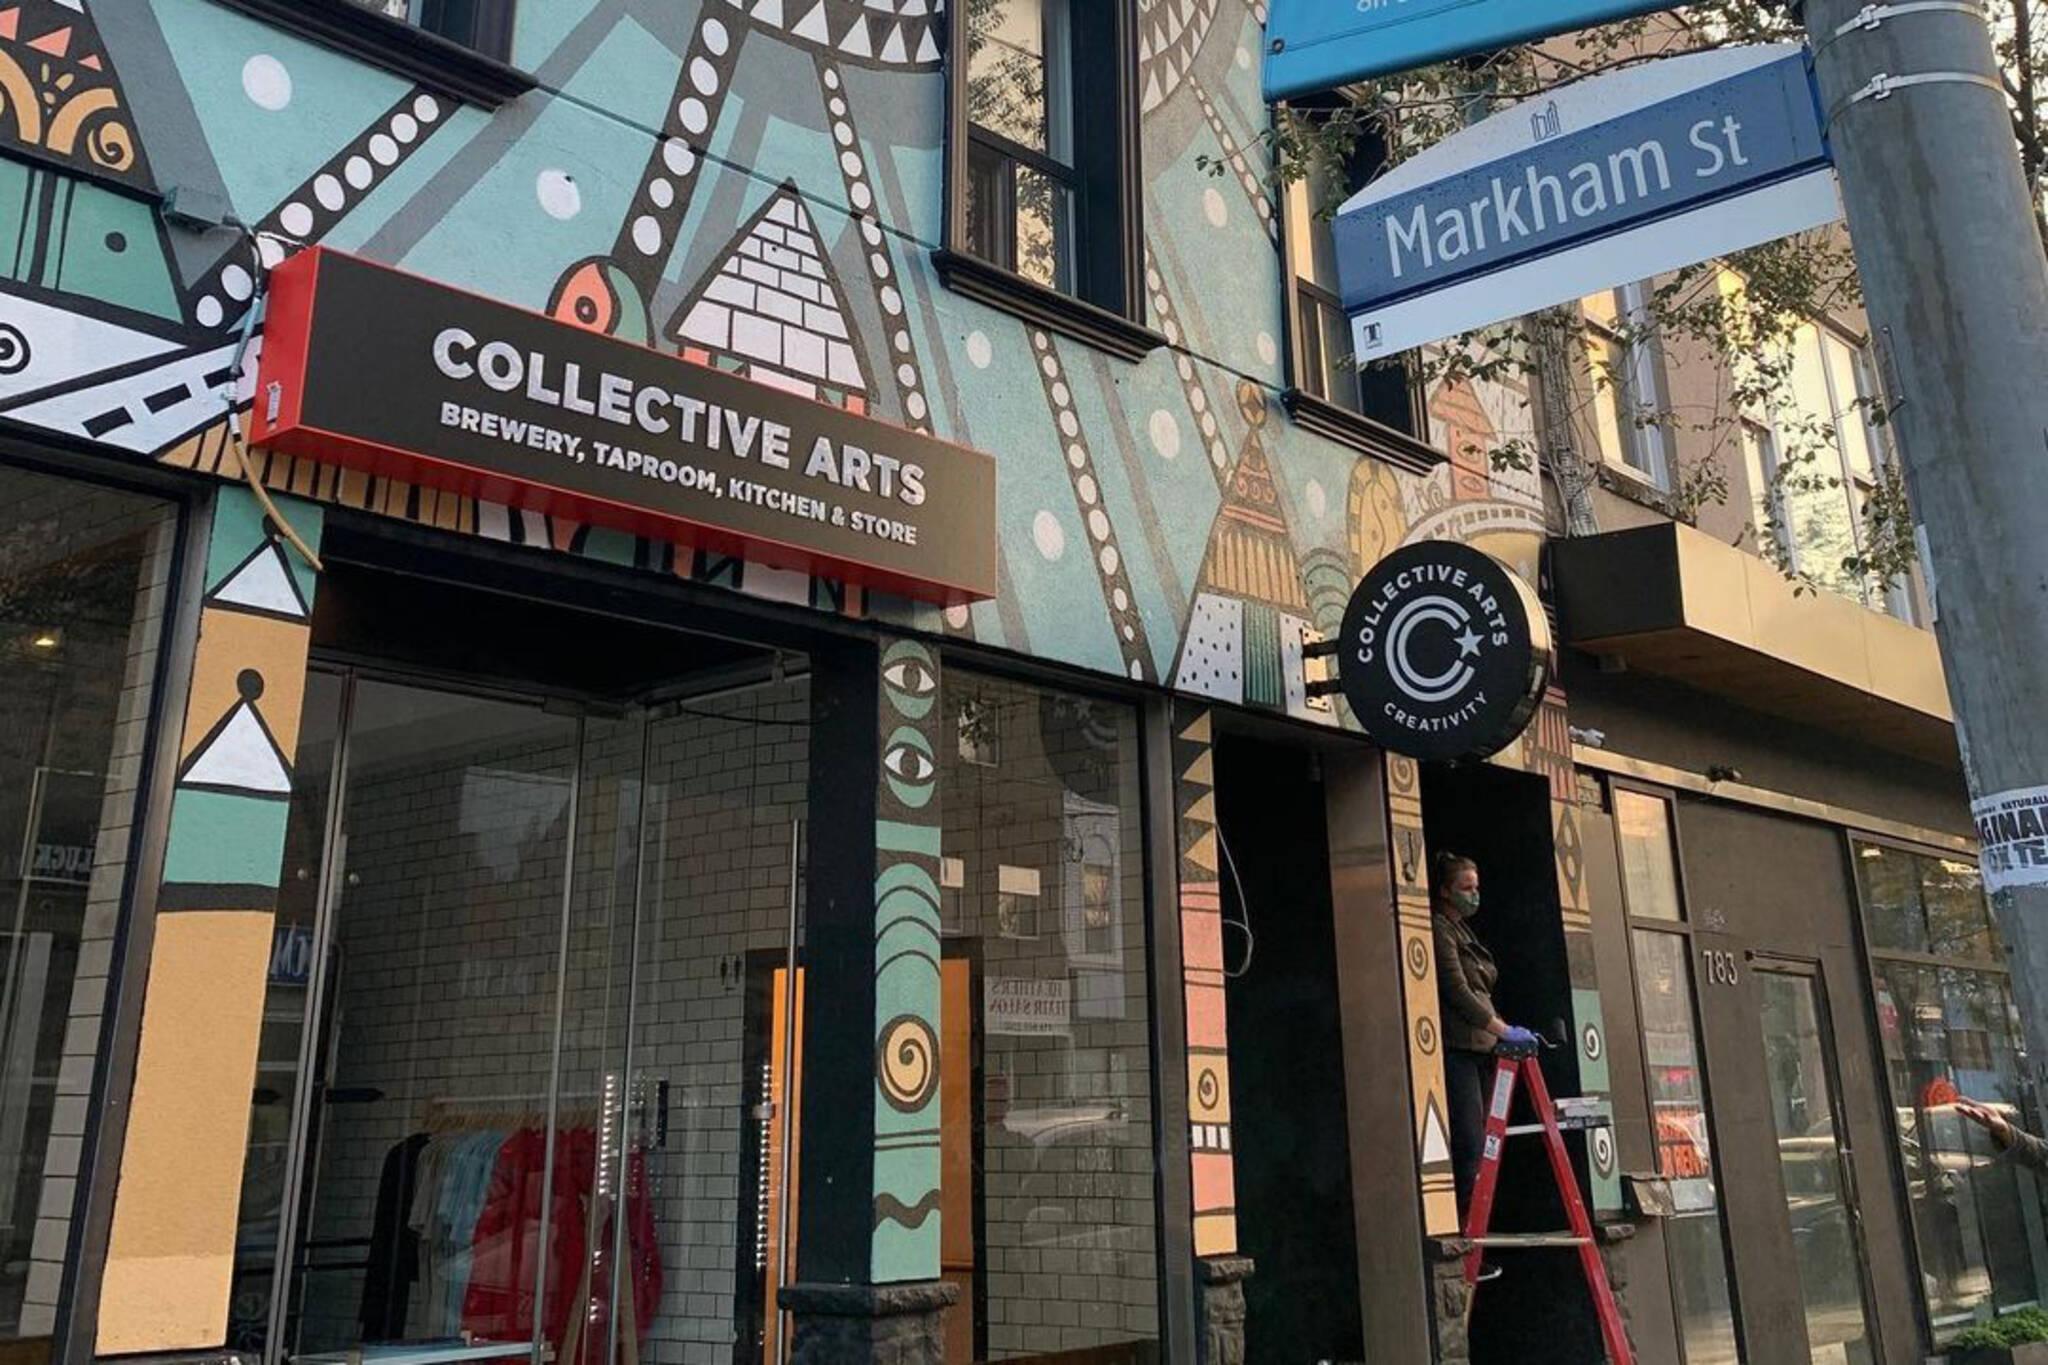 Collective Arts Brewing Toronto